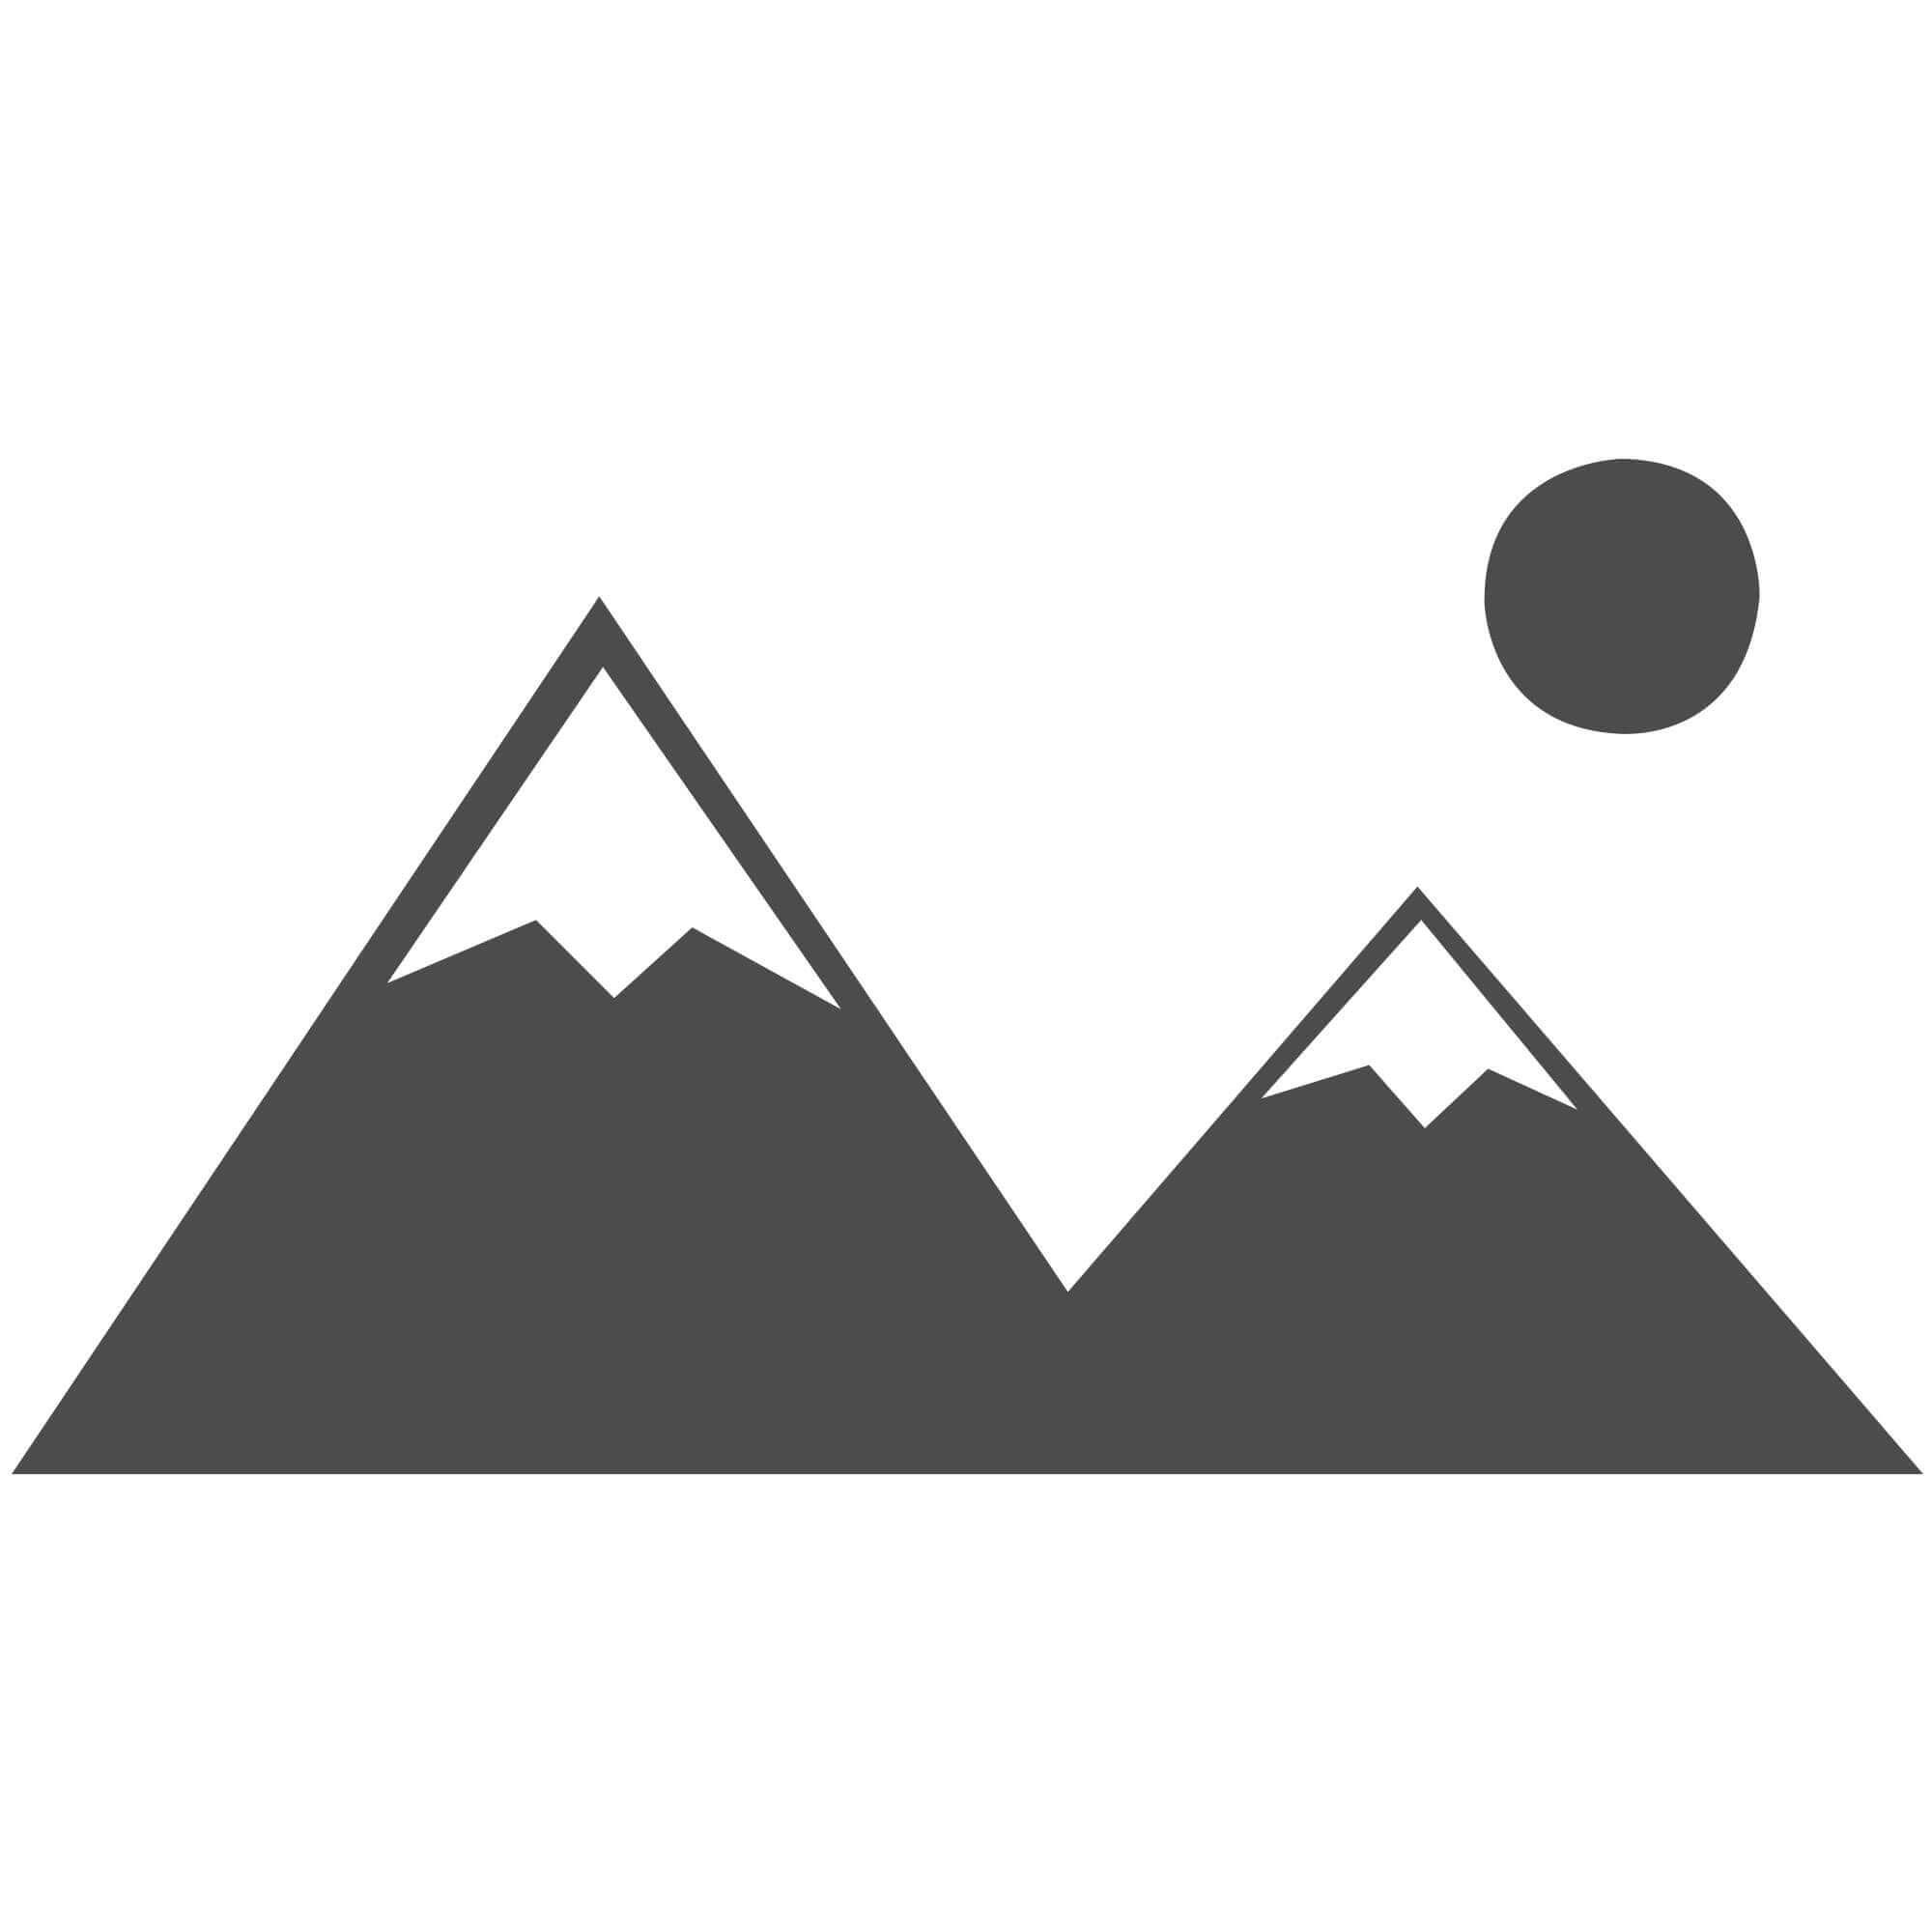 "Galleria Rug - Border Blue 63138 6191 - Size 133 x 195 cm (4'4"" x 6'5"")"